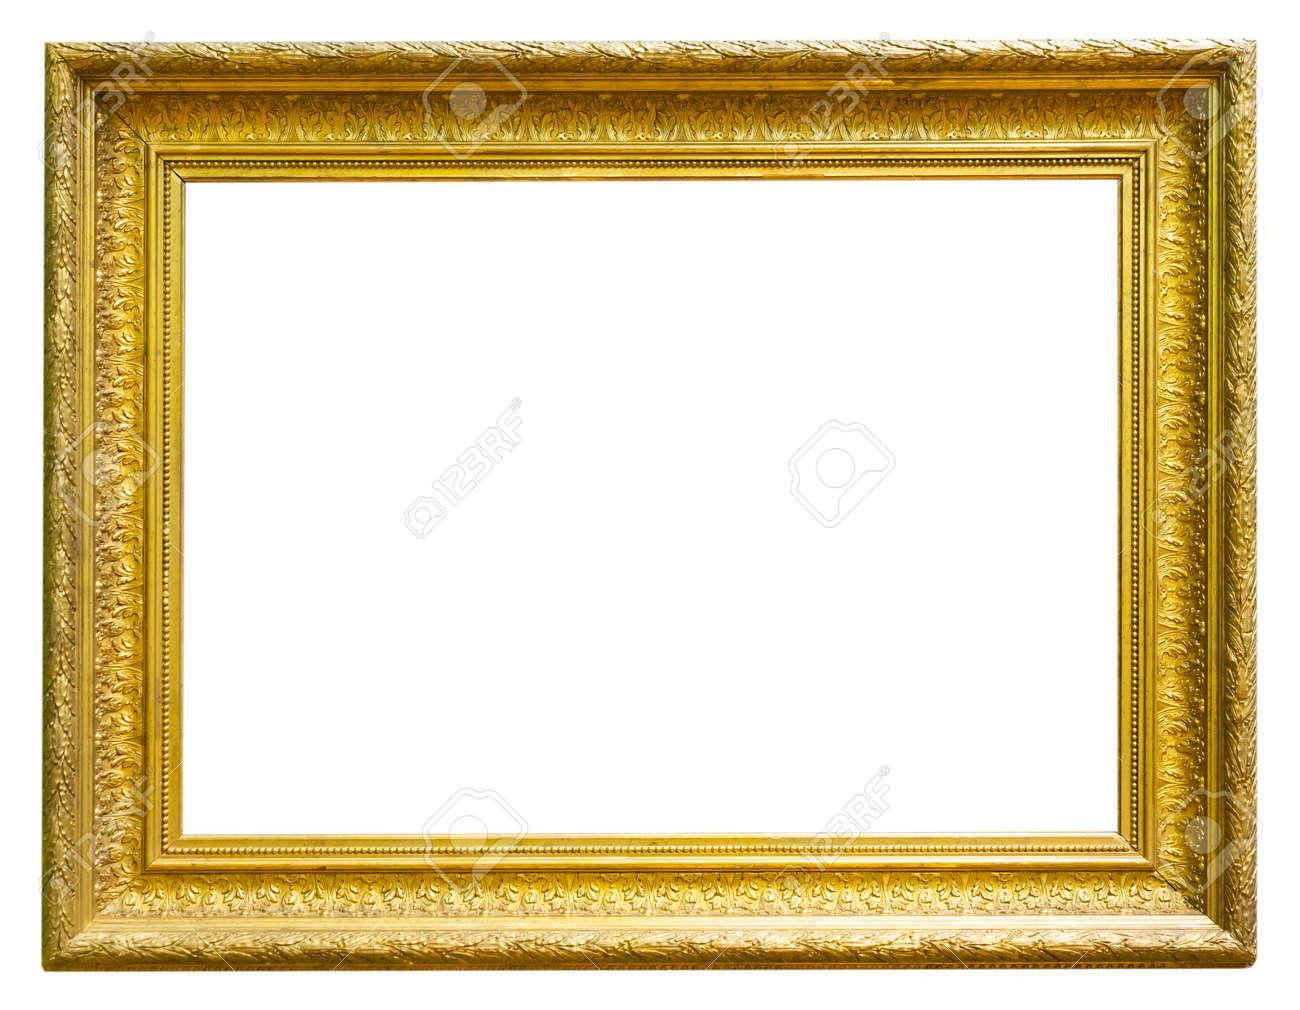 retro golden rectangular frame for photography on isolated background - 168870471